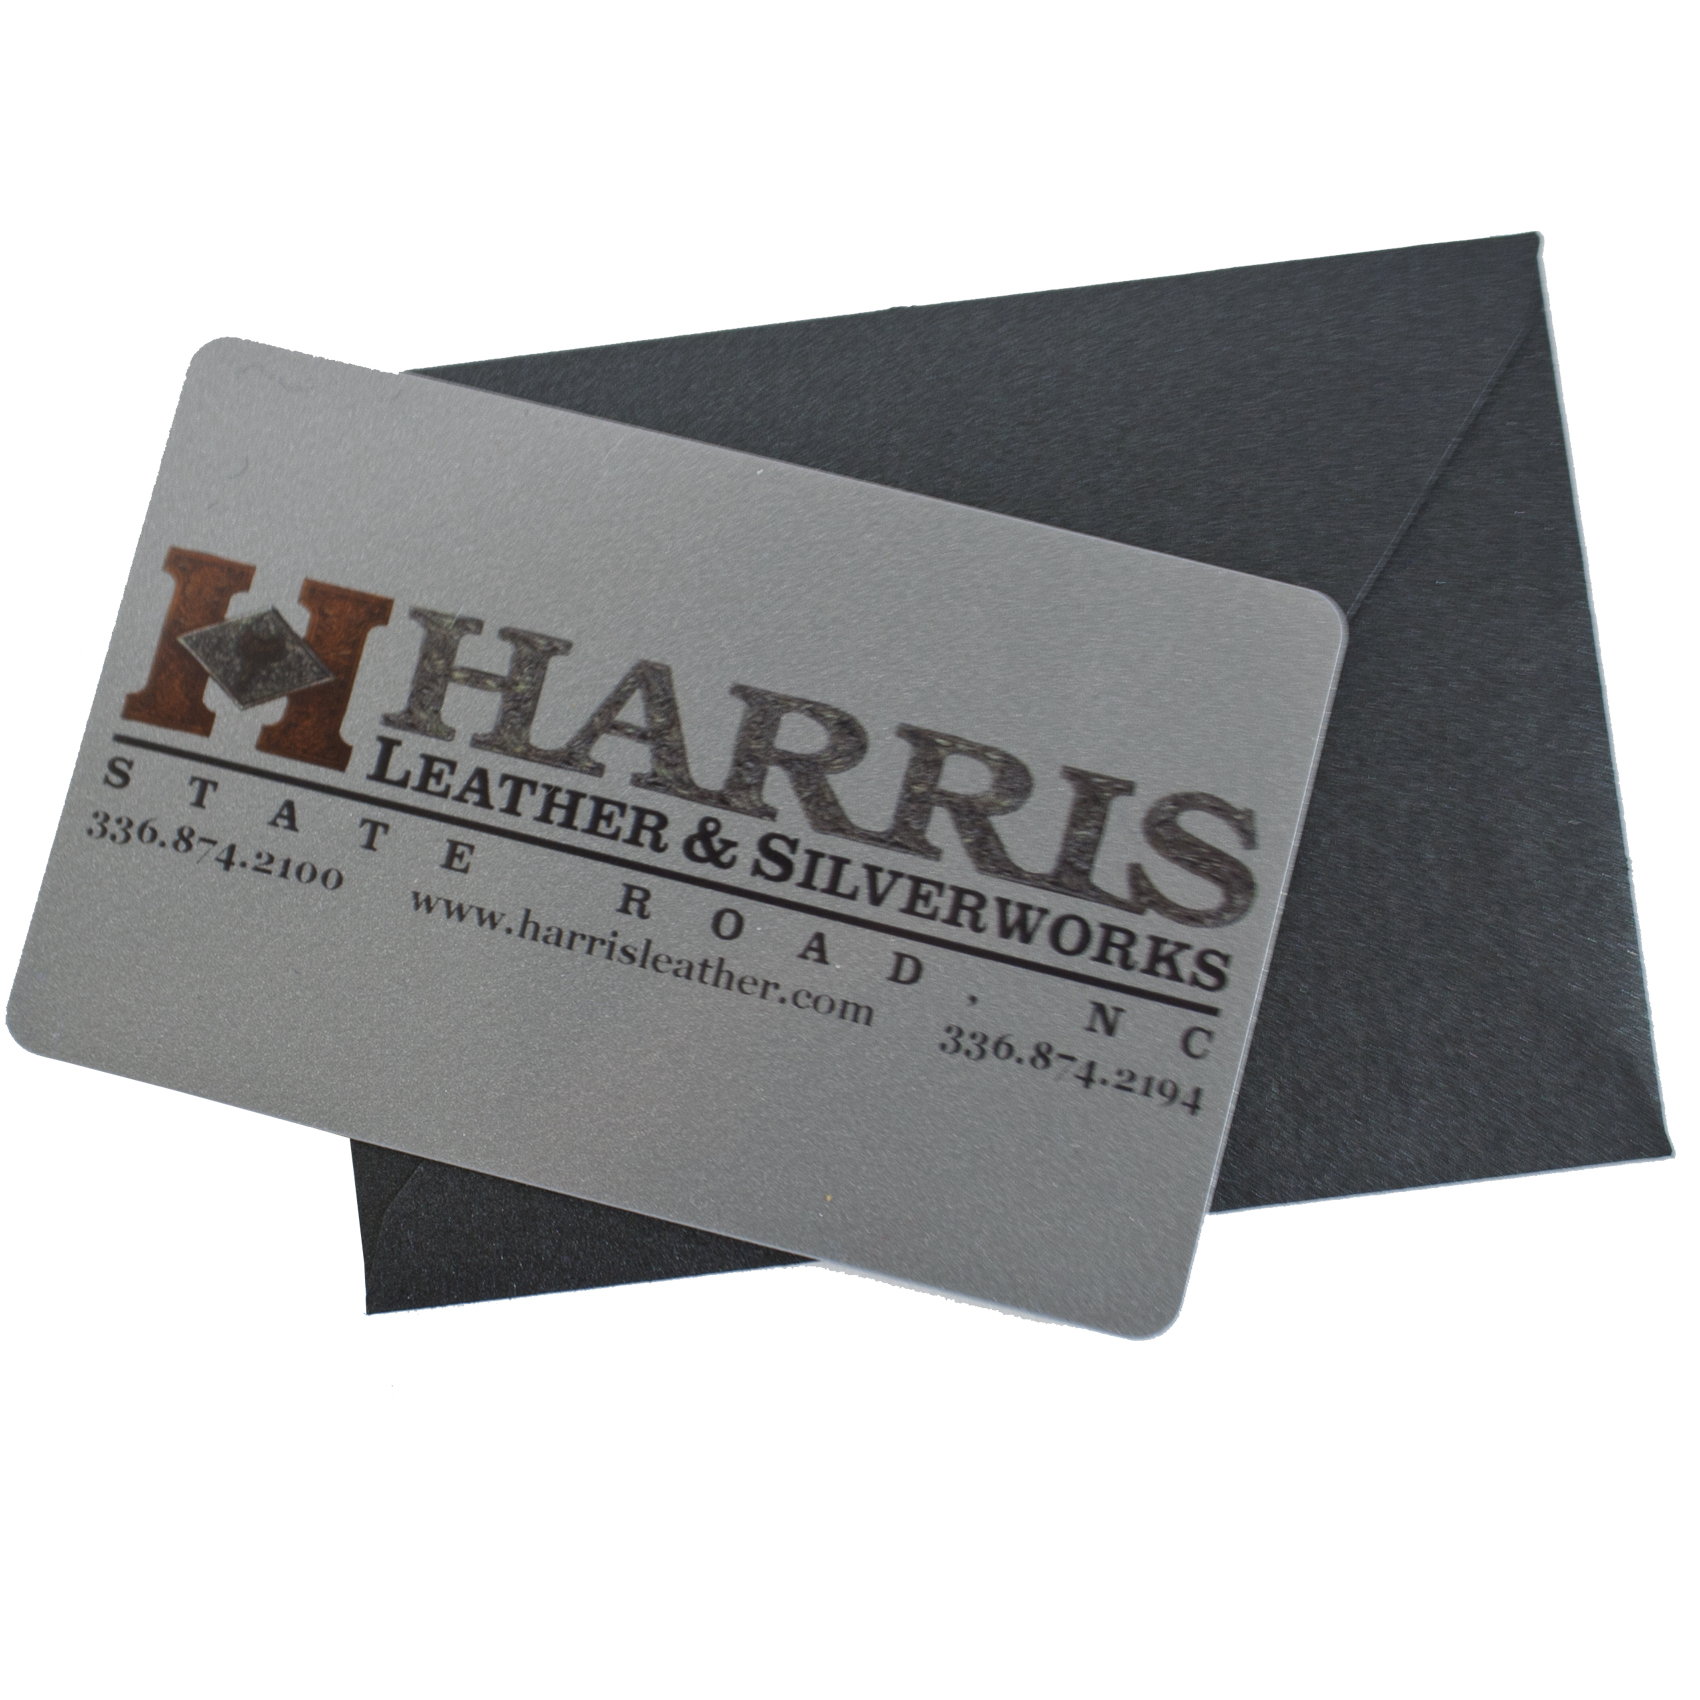 Harris Gift Cards | Harris Leather & Silverworks | Legendary ...